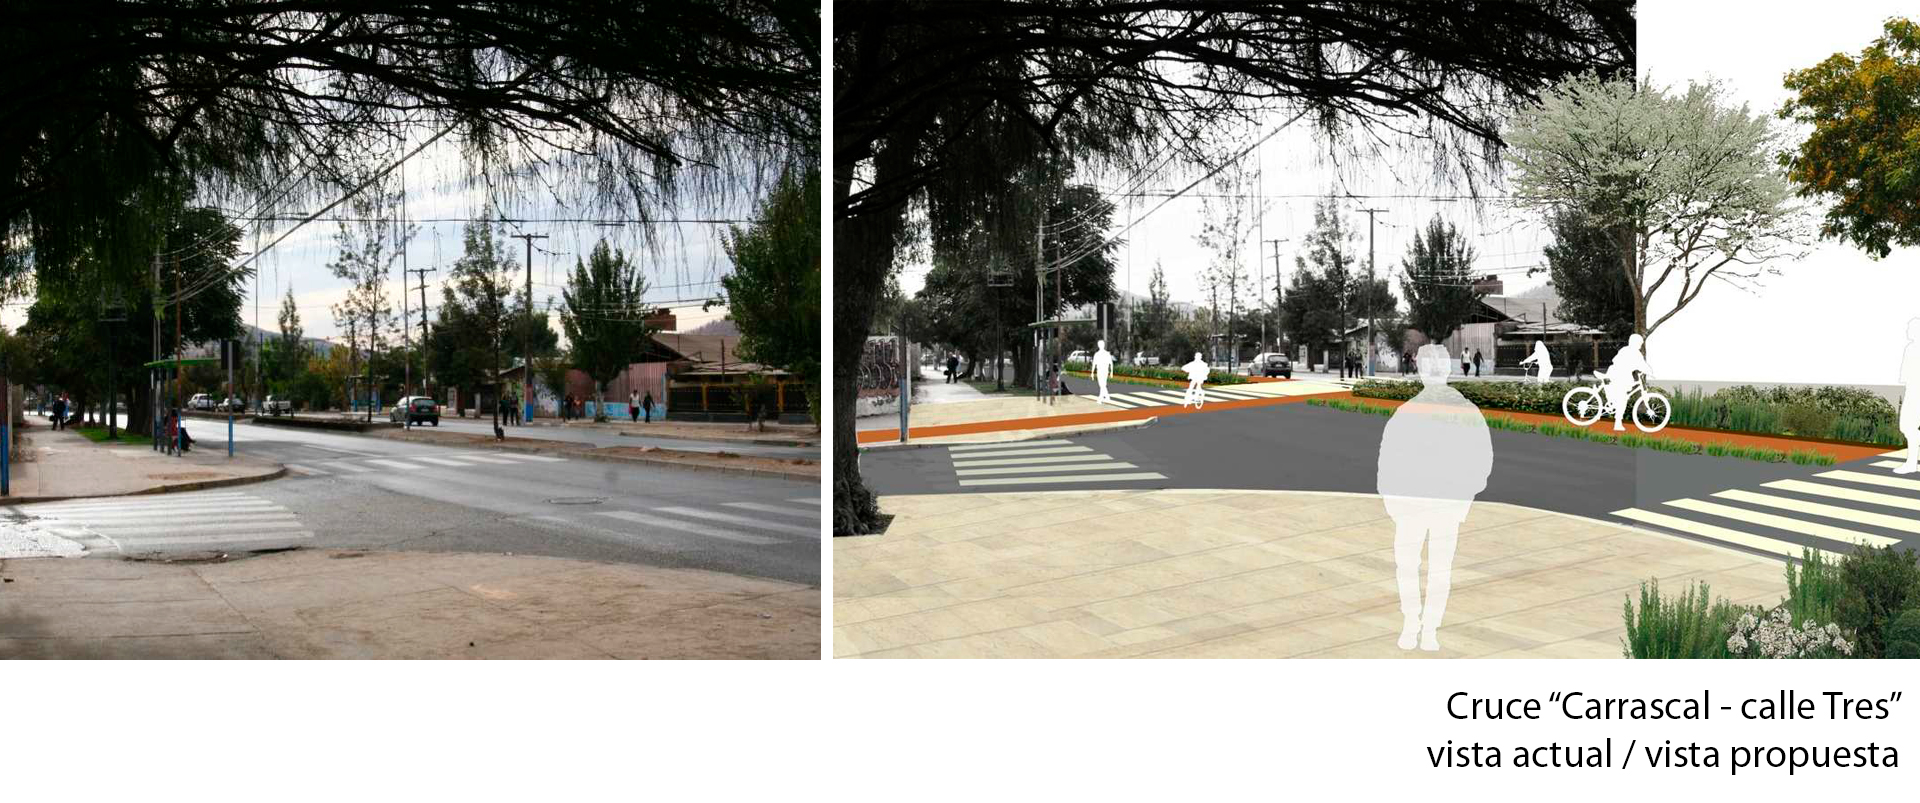 Cruce Carrascal calle Tres vista actual y propuesta